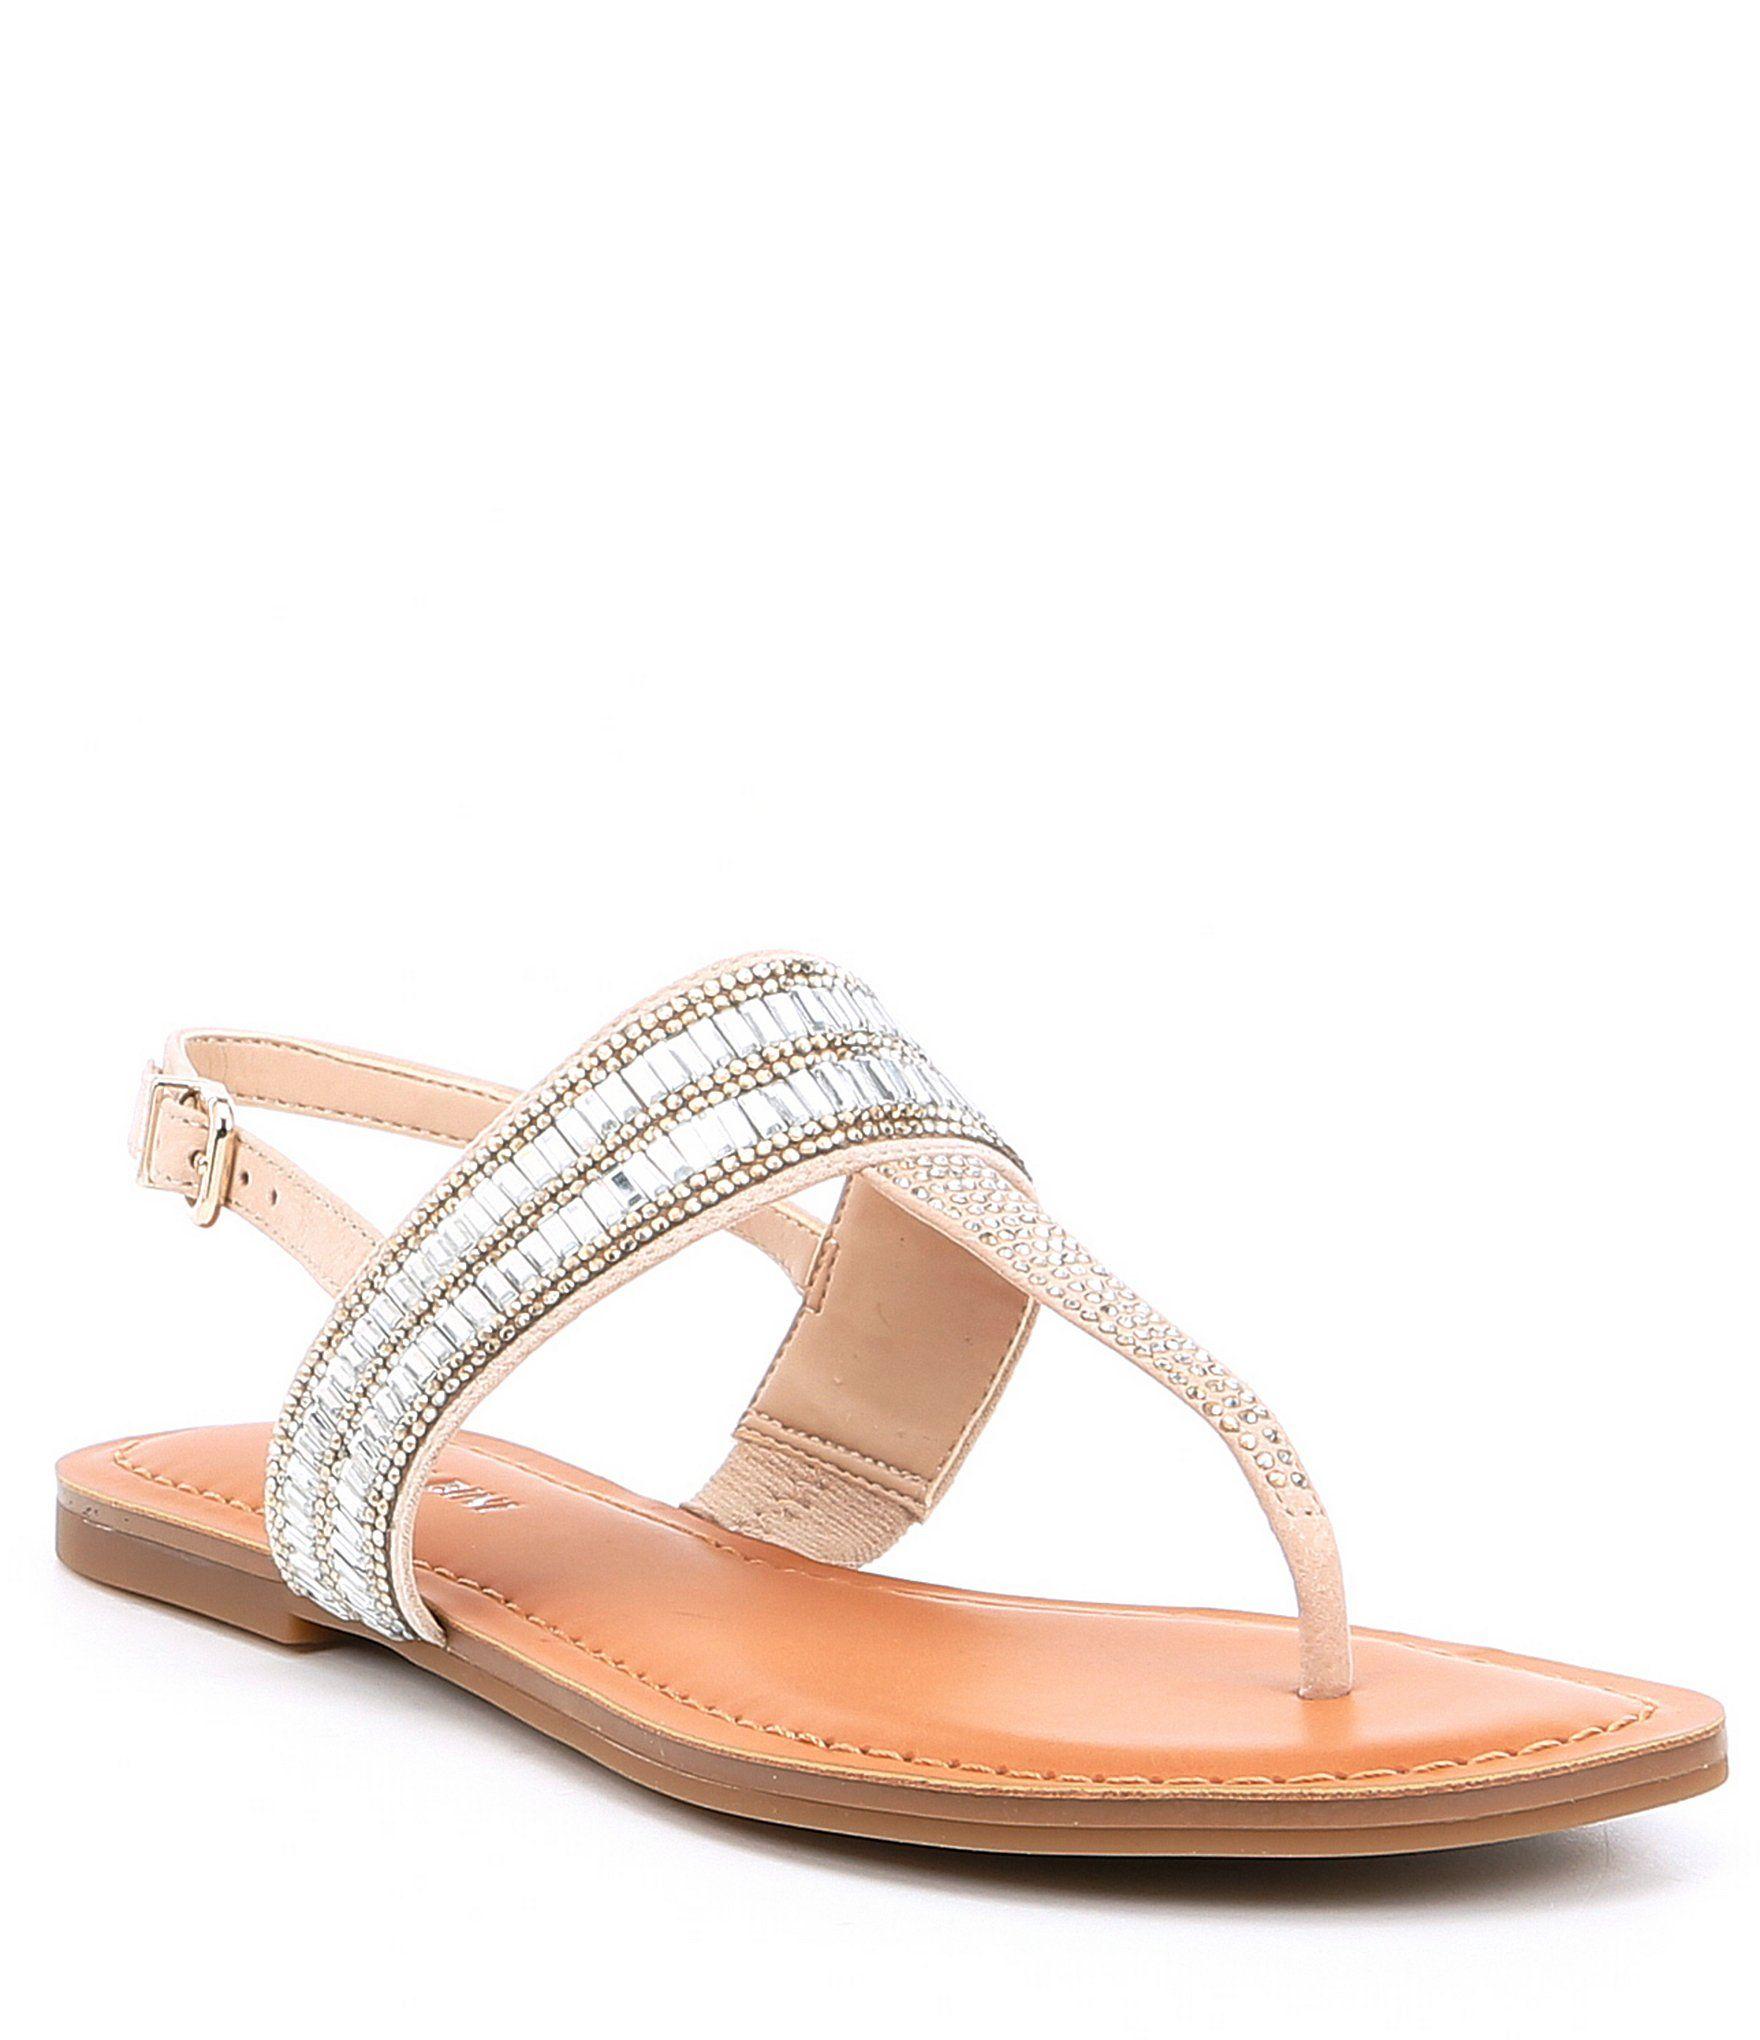 dillards sandals on sale